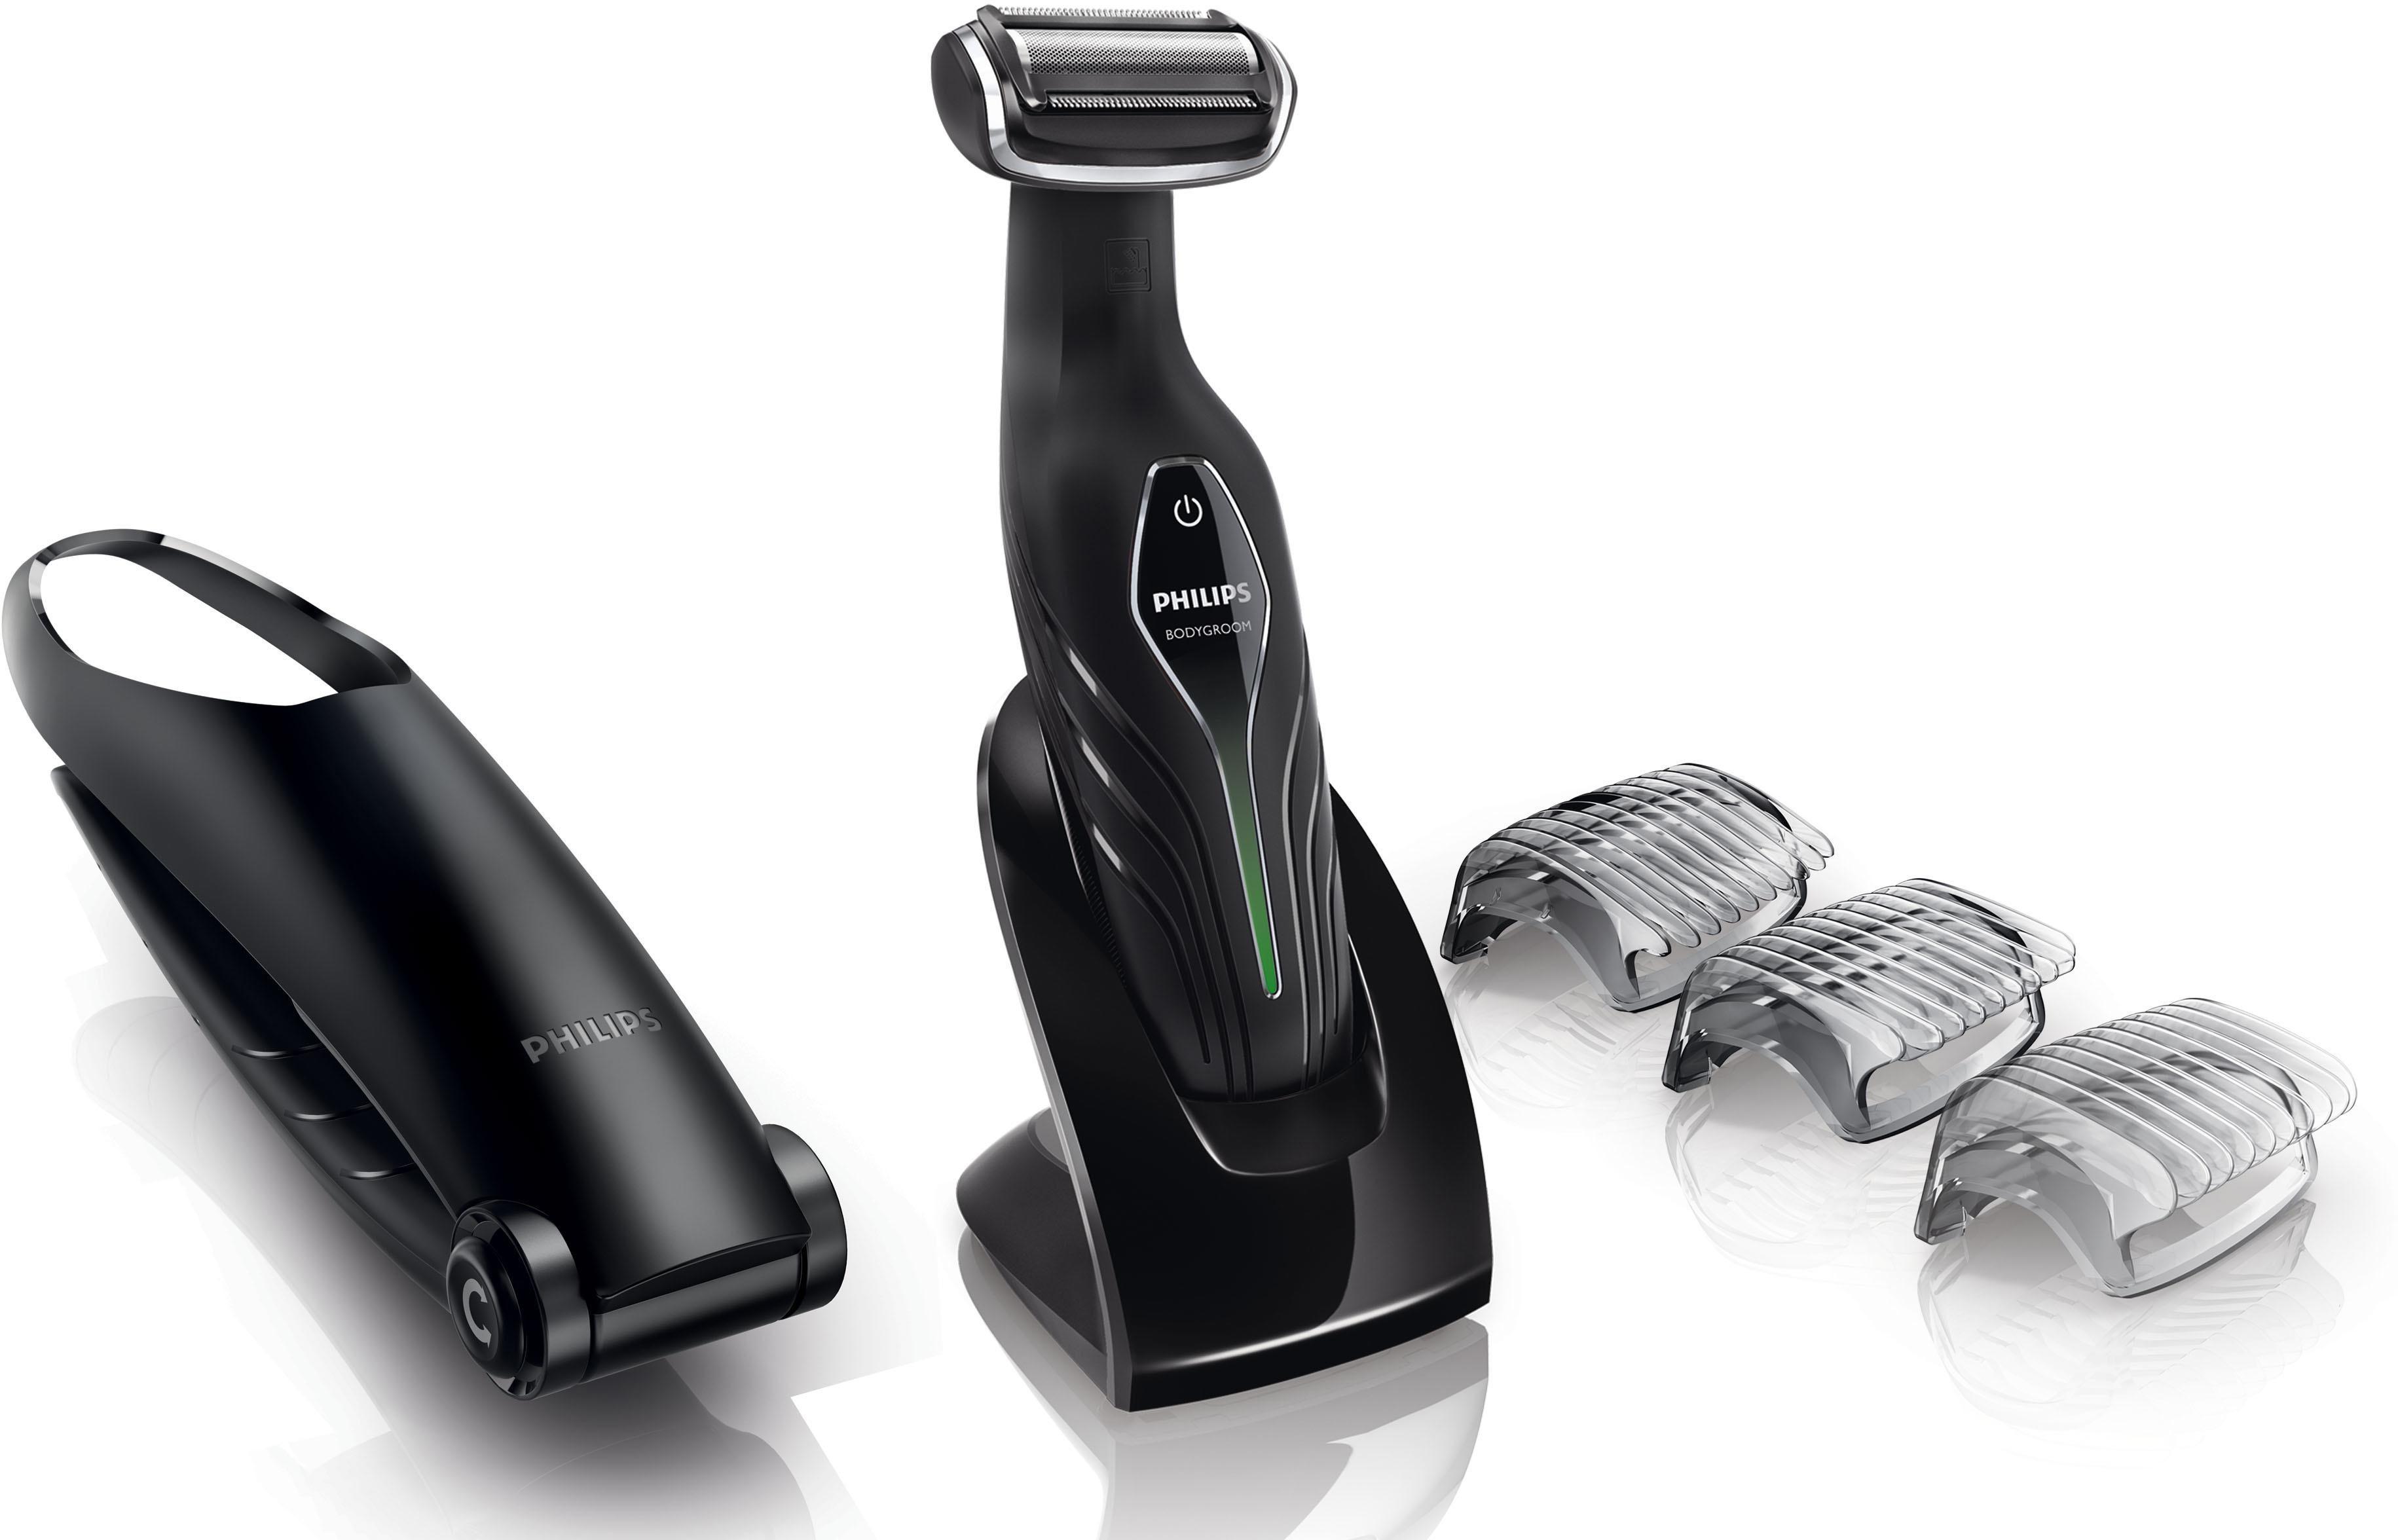 Philips Männerkörper-Rasierer Series 5000 BG2036/32 , Bodygroom Plus